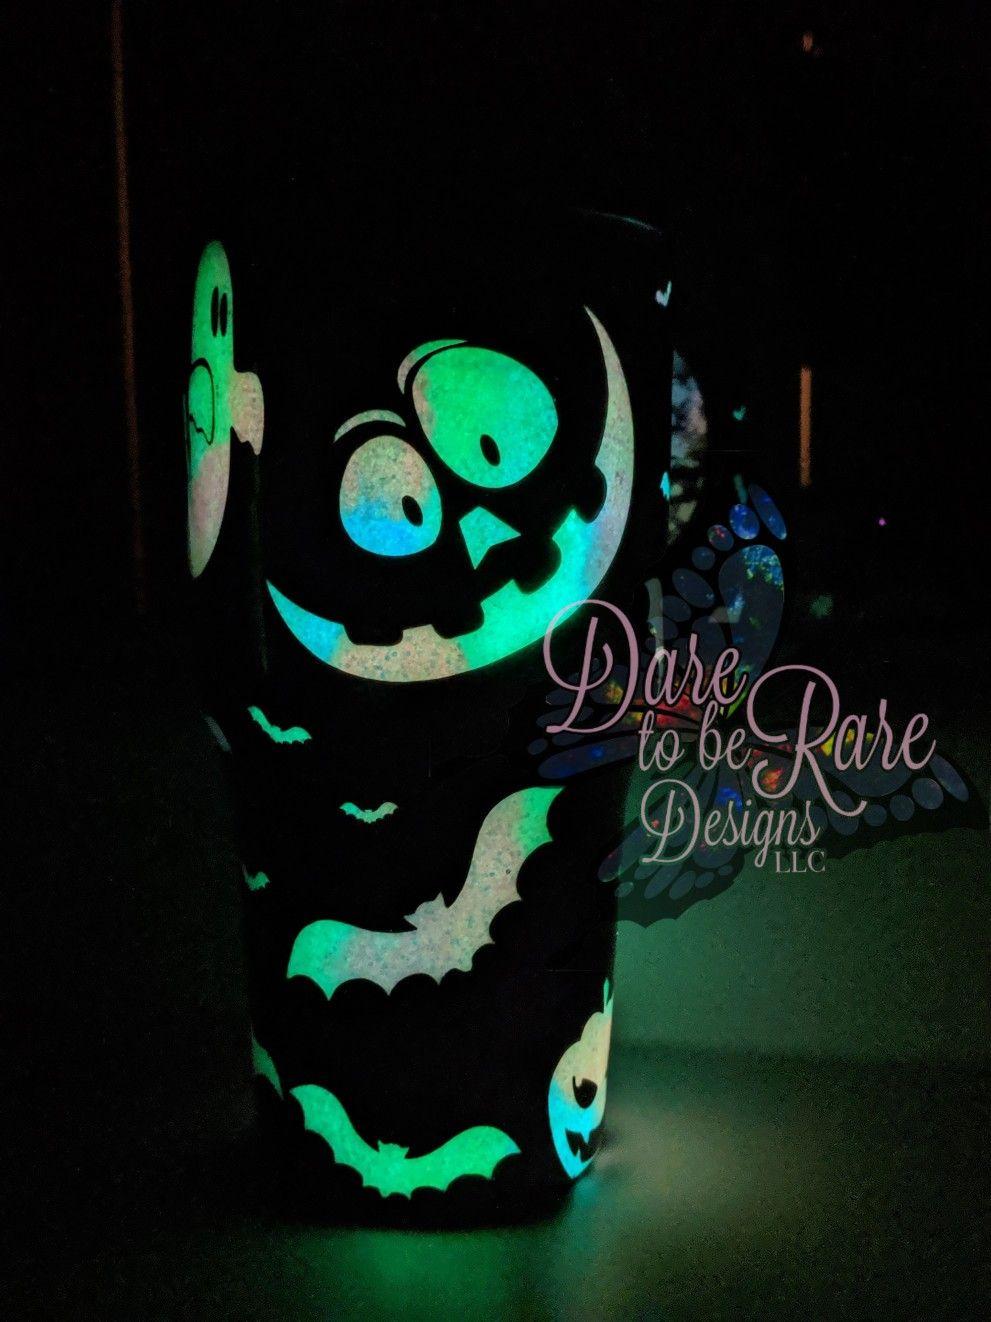 30 Oz Glow In The Dark Tumbler Tumbler Cups Diy Custom Tumbler Cups Glitter Tumbler Cups